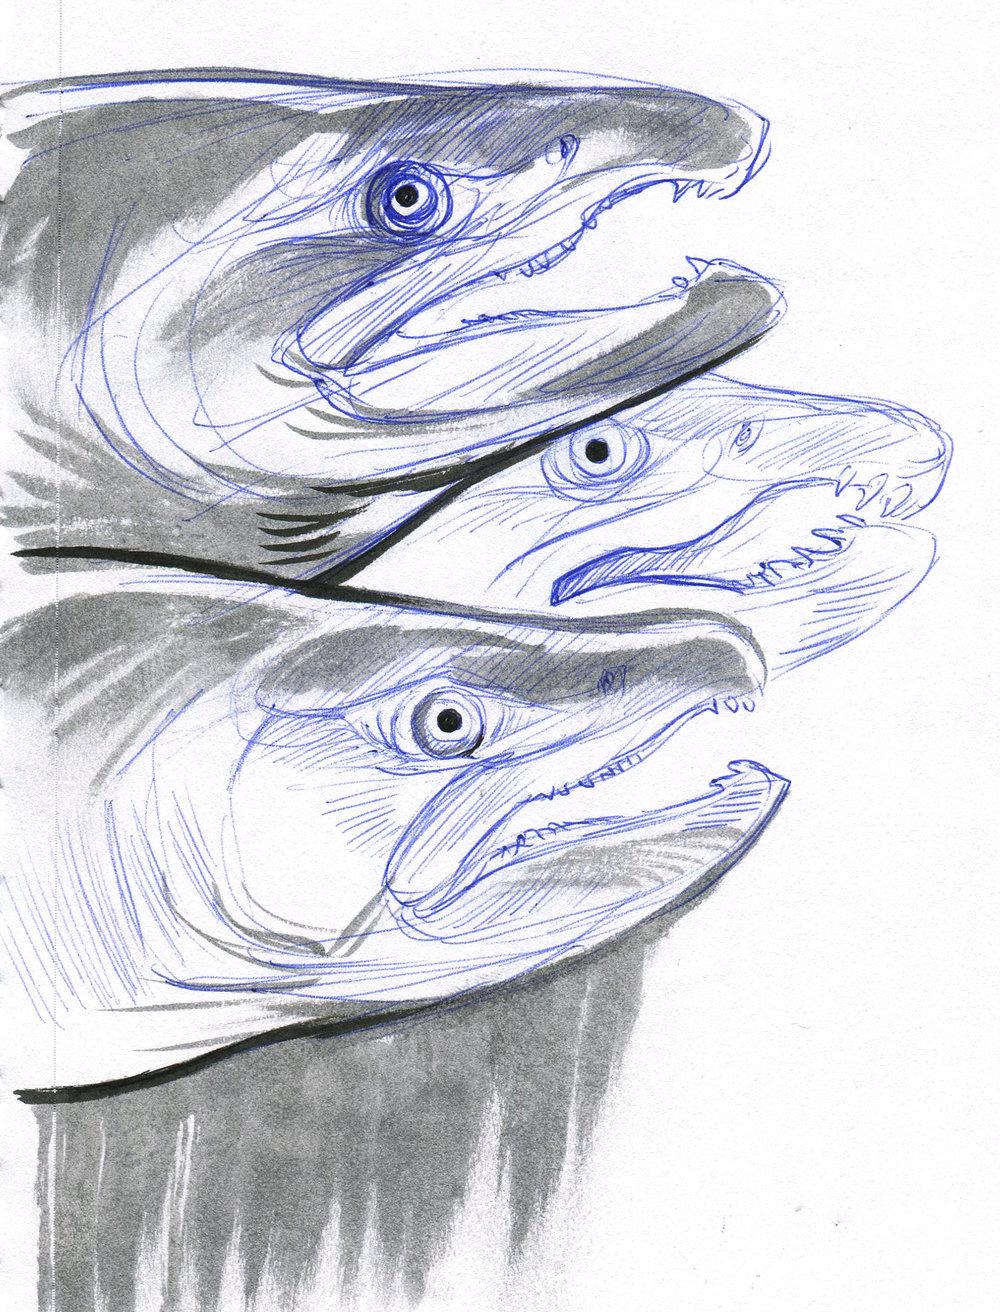 10-24-2017_fish.jpg